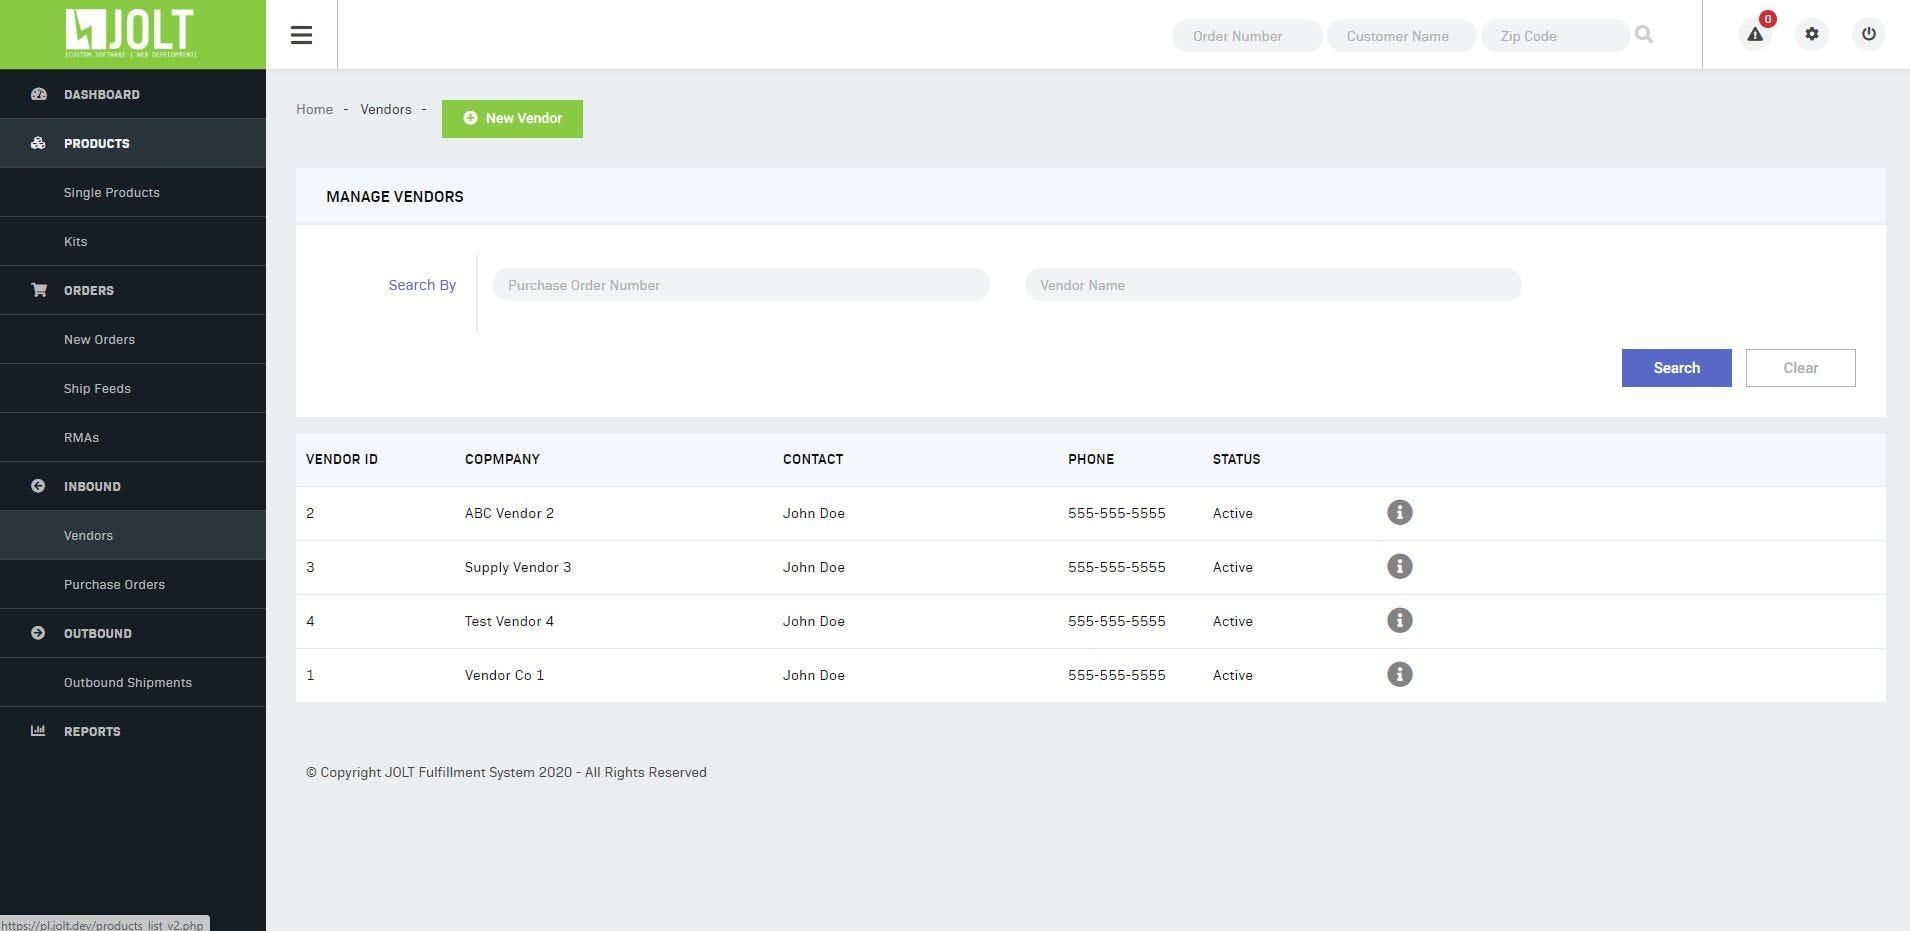 Jolt Fulfillment System Software - Jolt Fulfillment System vendor management